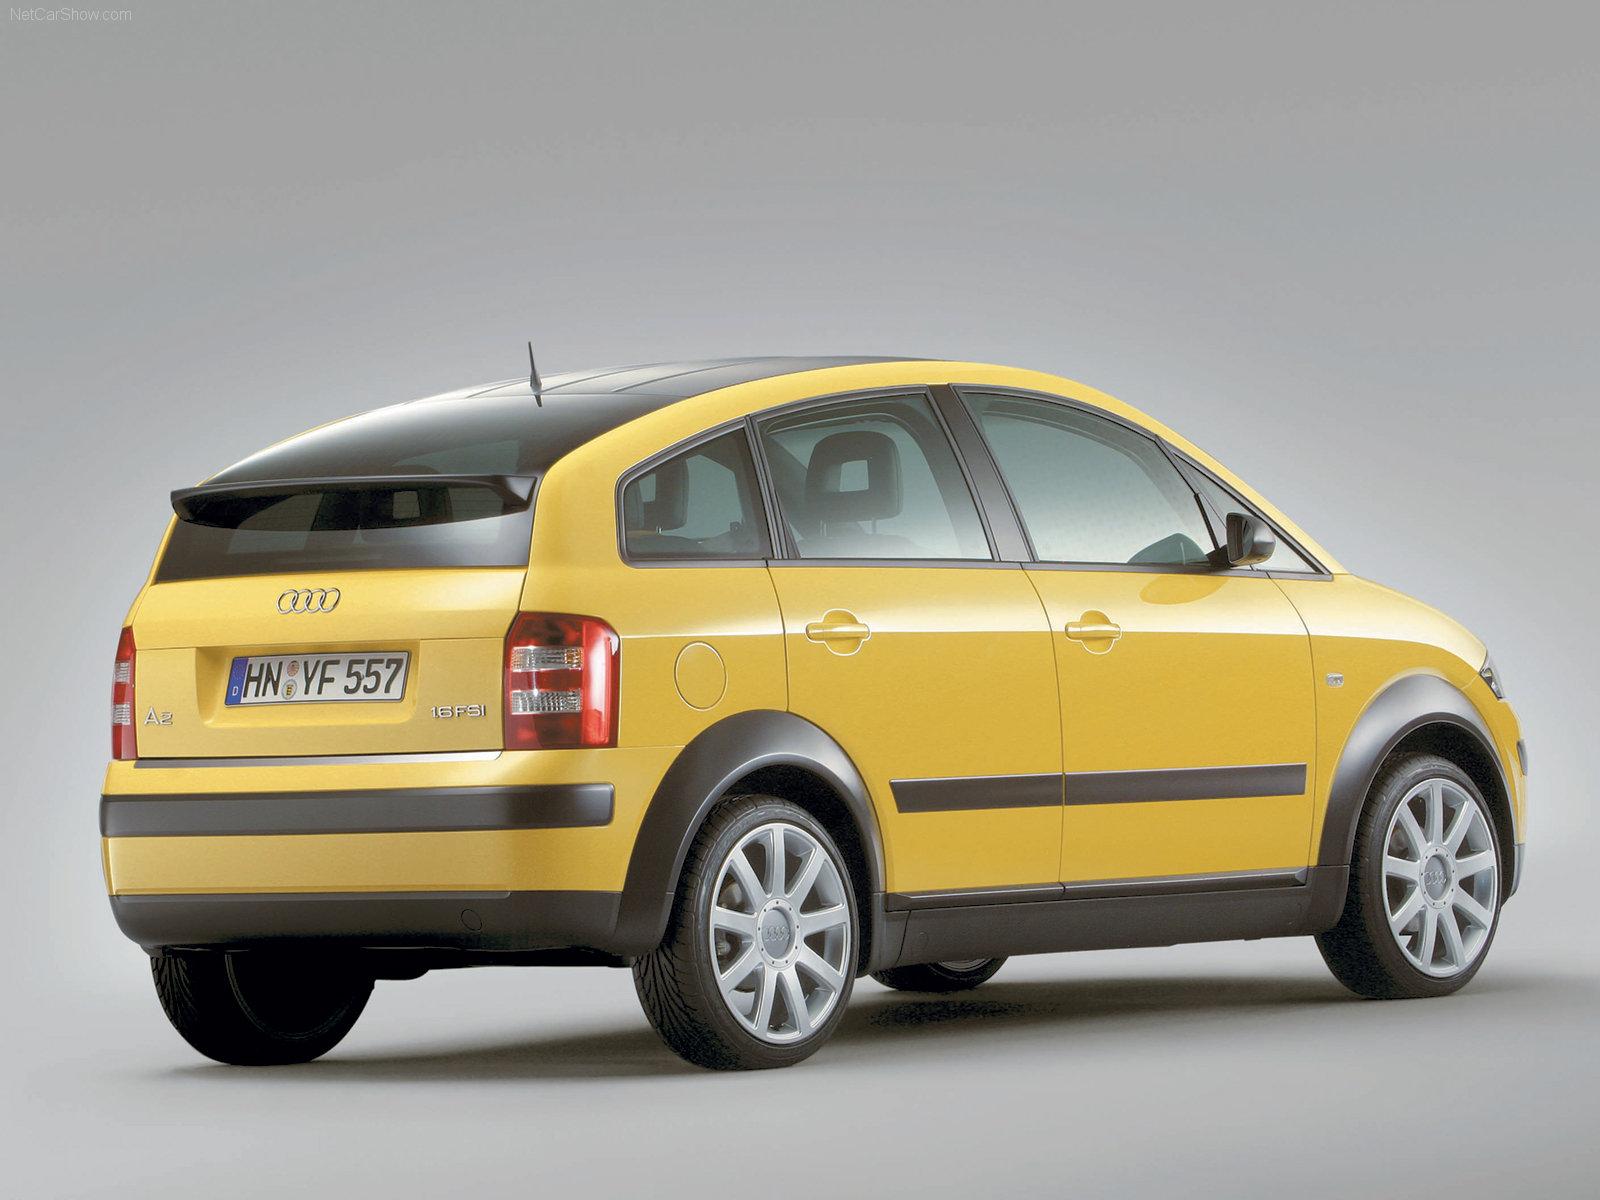 Audi-A2_2003_1600x1200_wallpaper_1d.jpg.0960a43fb1b4907dfb9d36569603f8f6.jpg